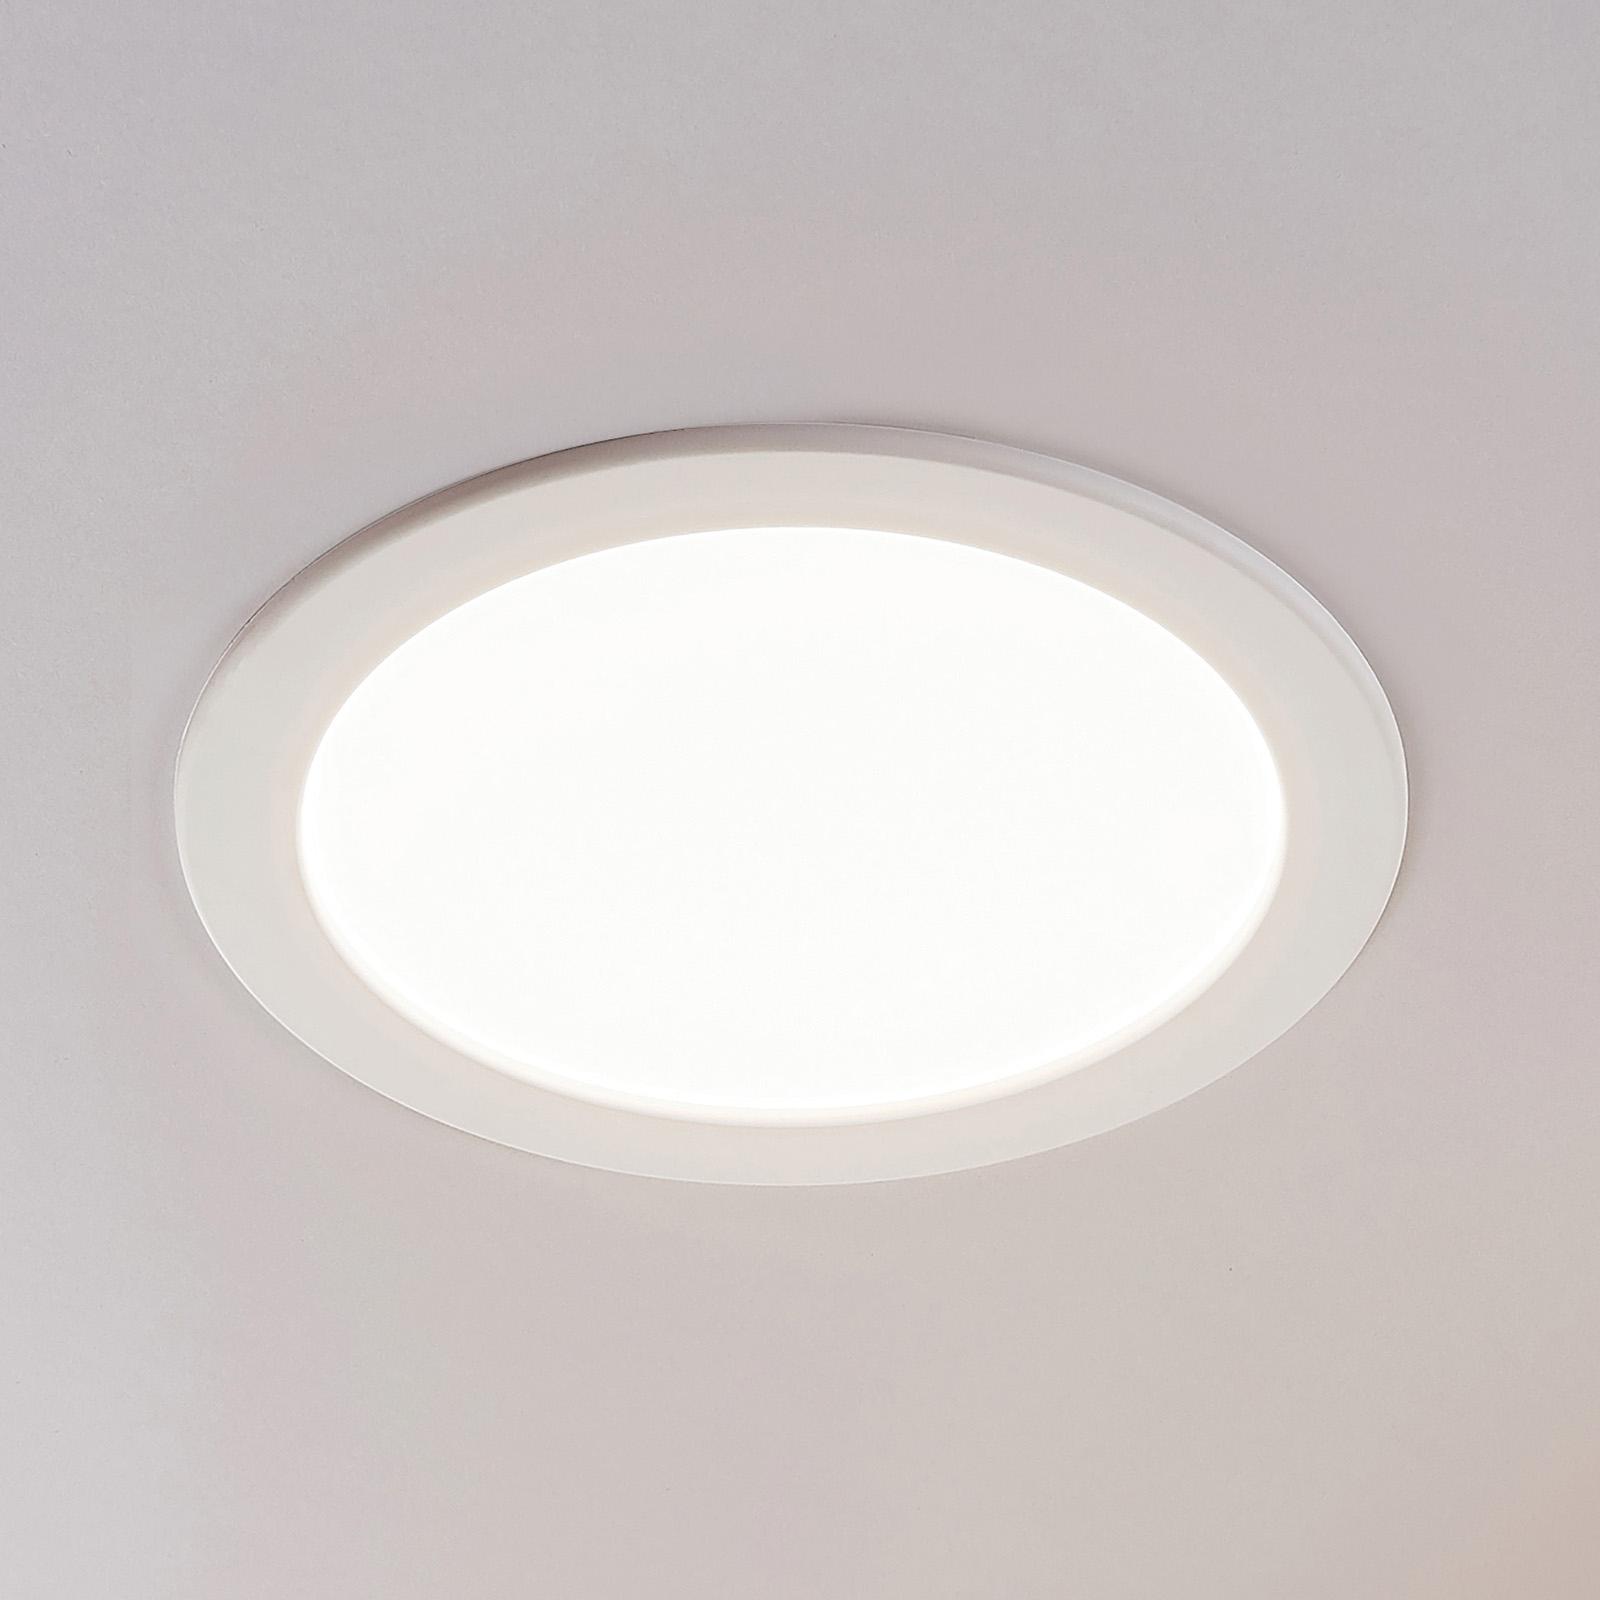 LED-Einbaustrahler Joki weiß 3000K rund 24cm